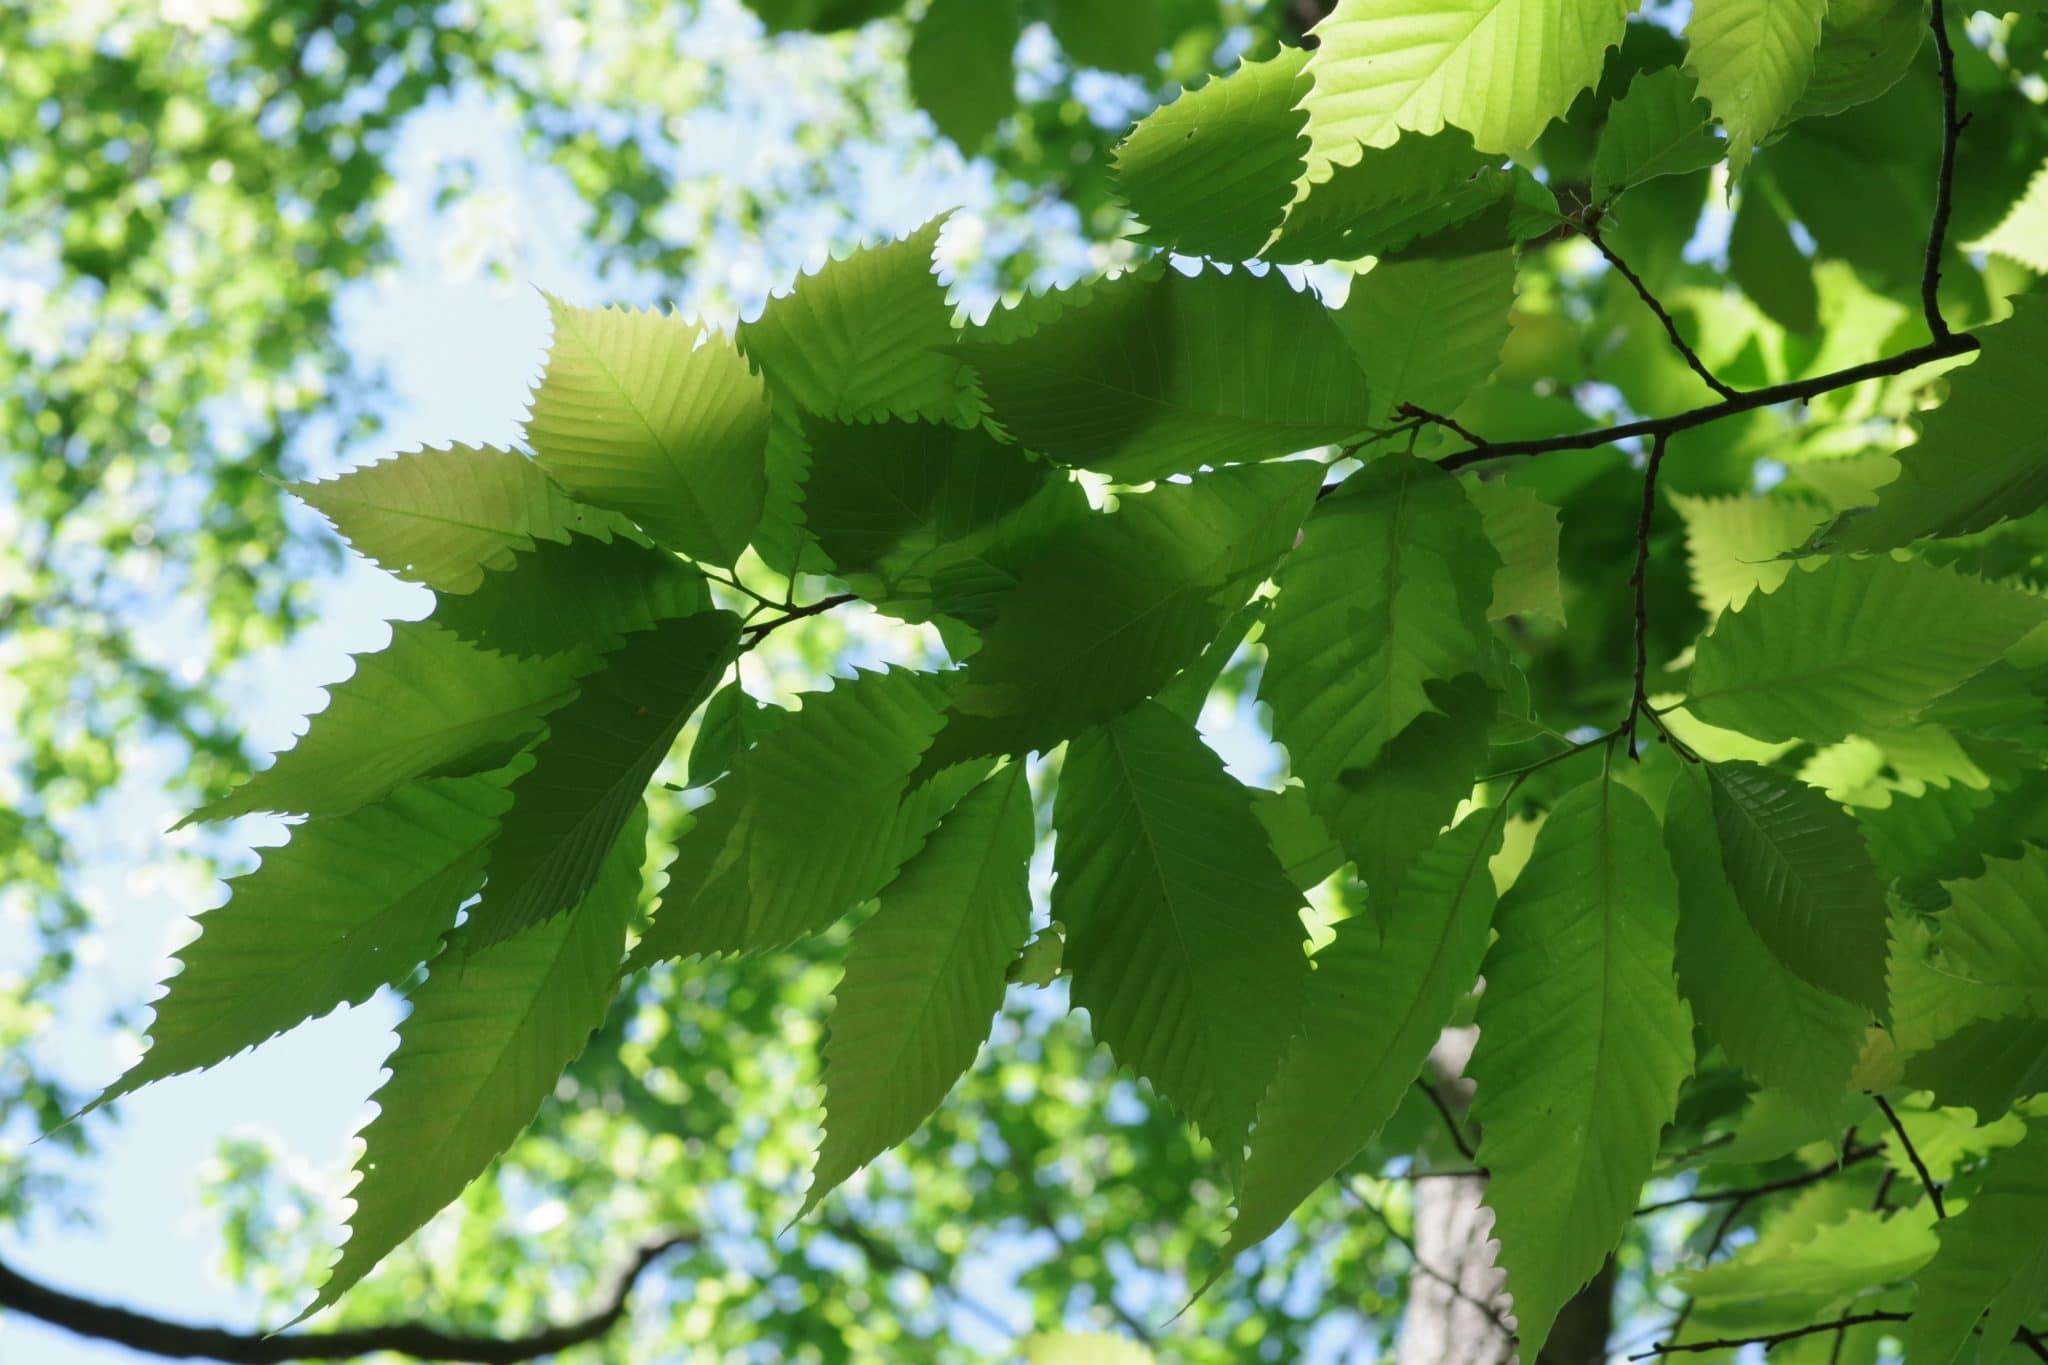 American Chestnut leaves